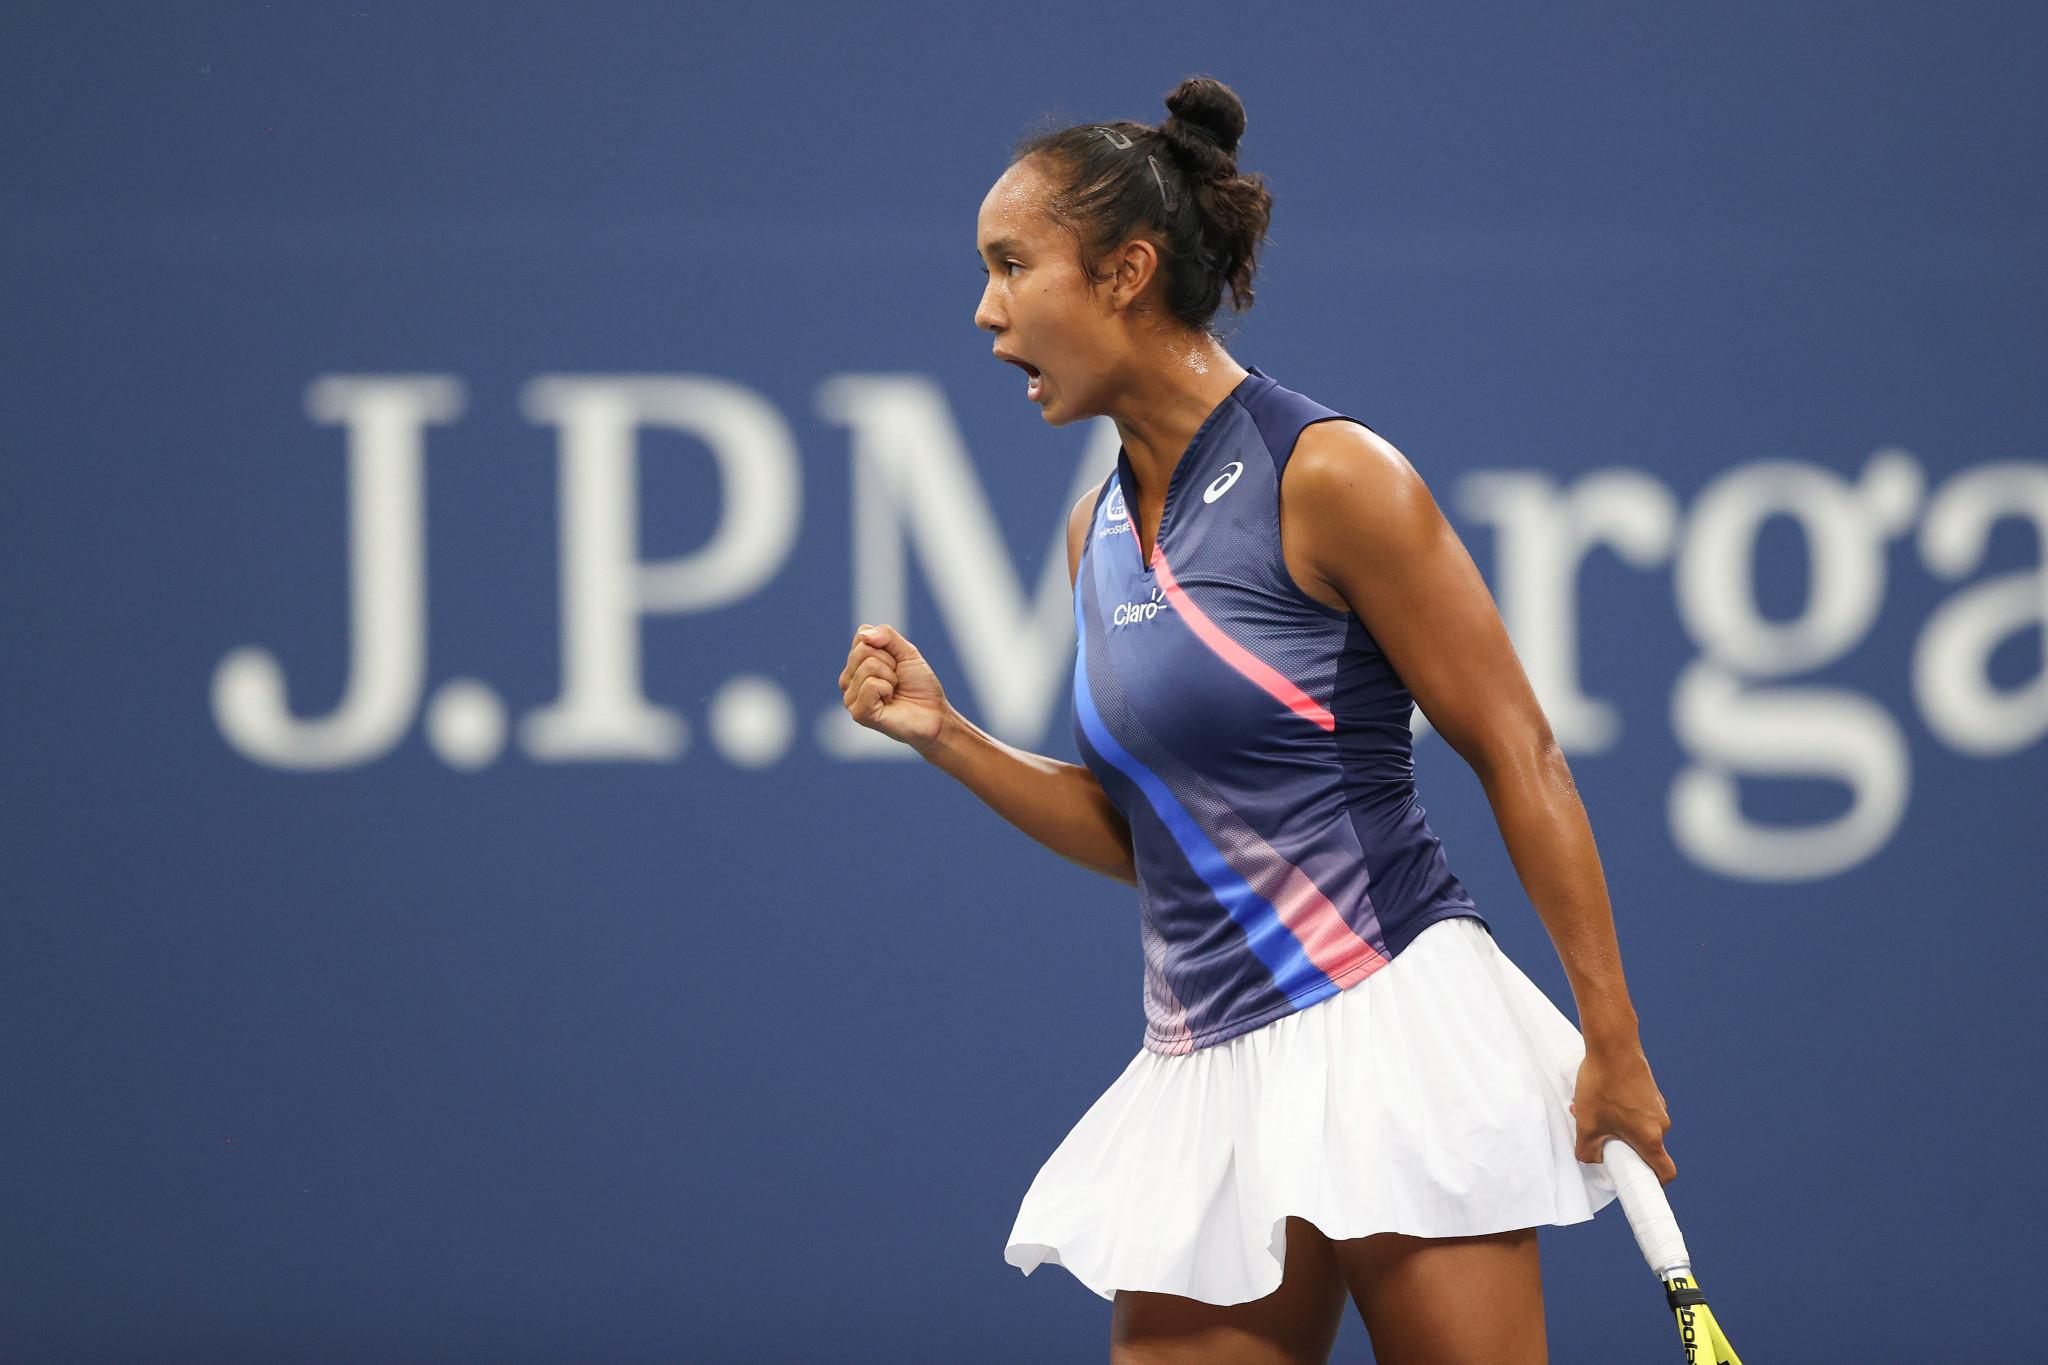 Teenager Fernandez upsets former US Open champion Kerber as fourth round begins